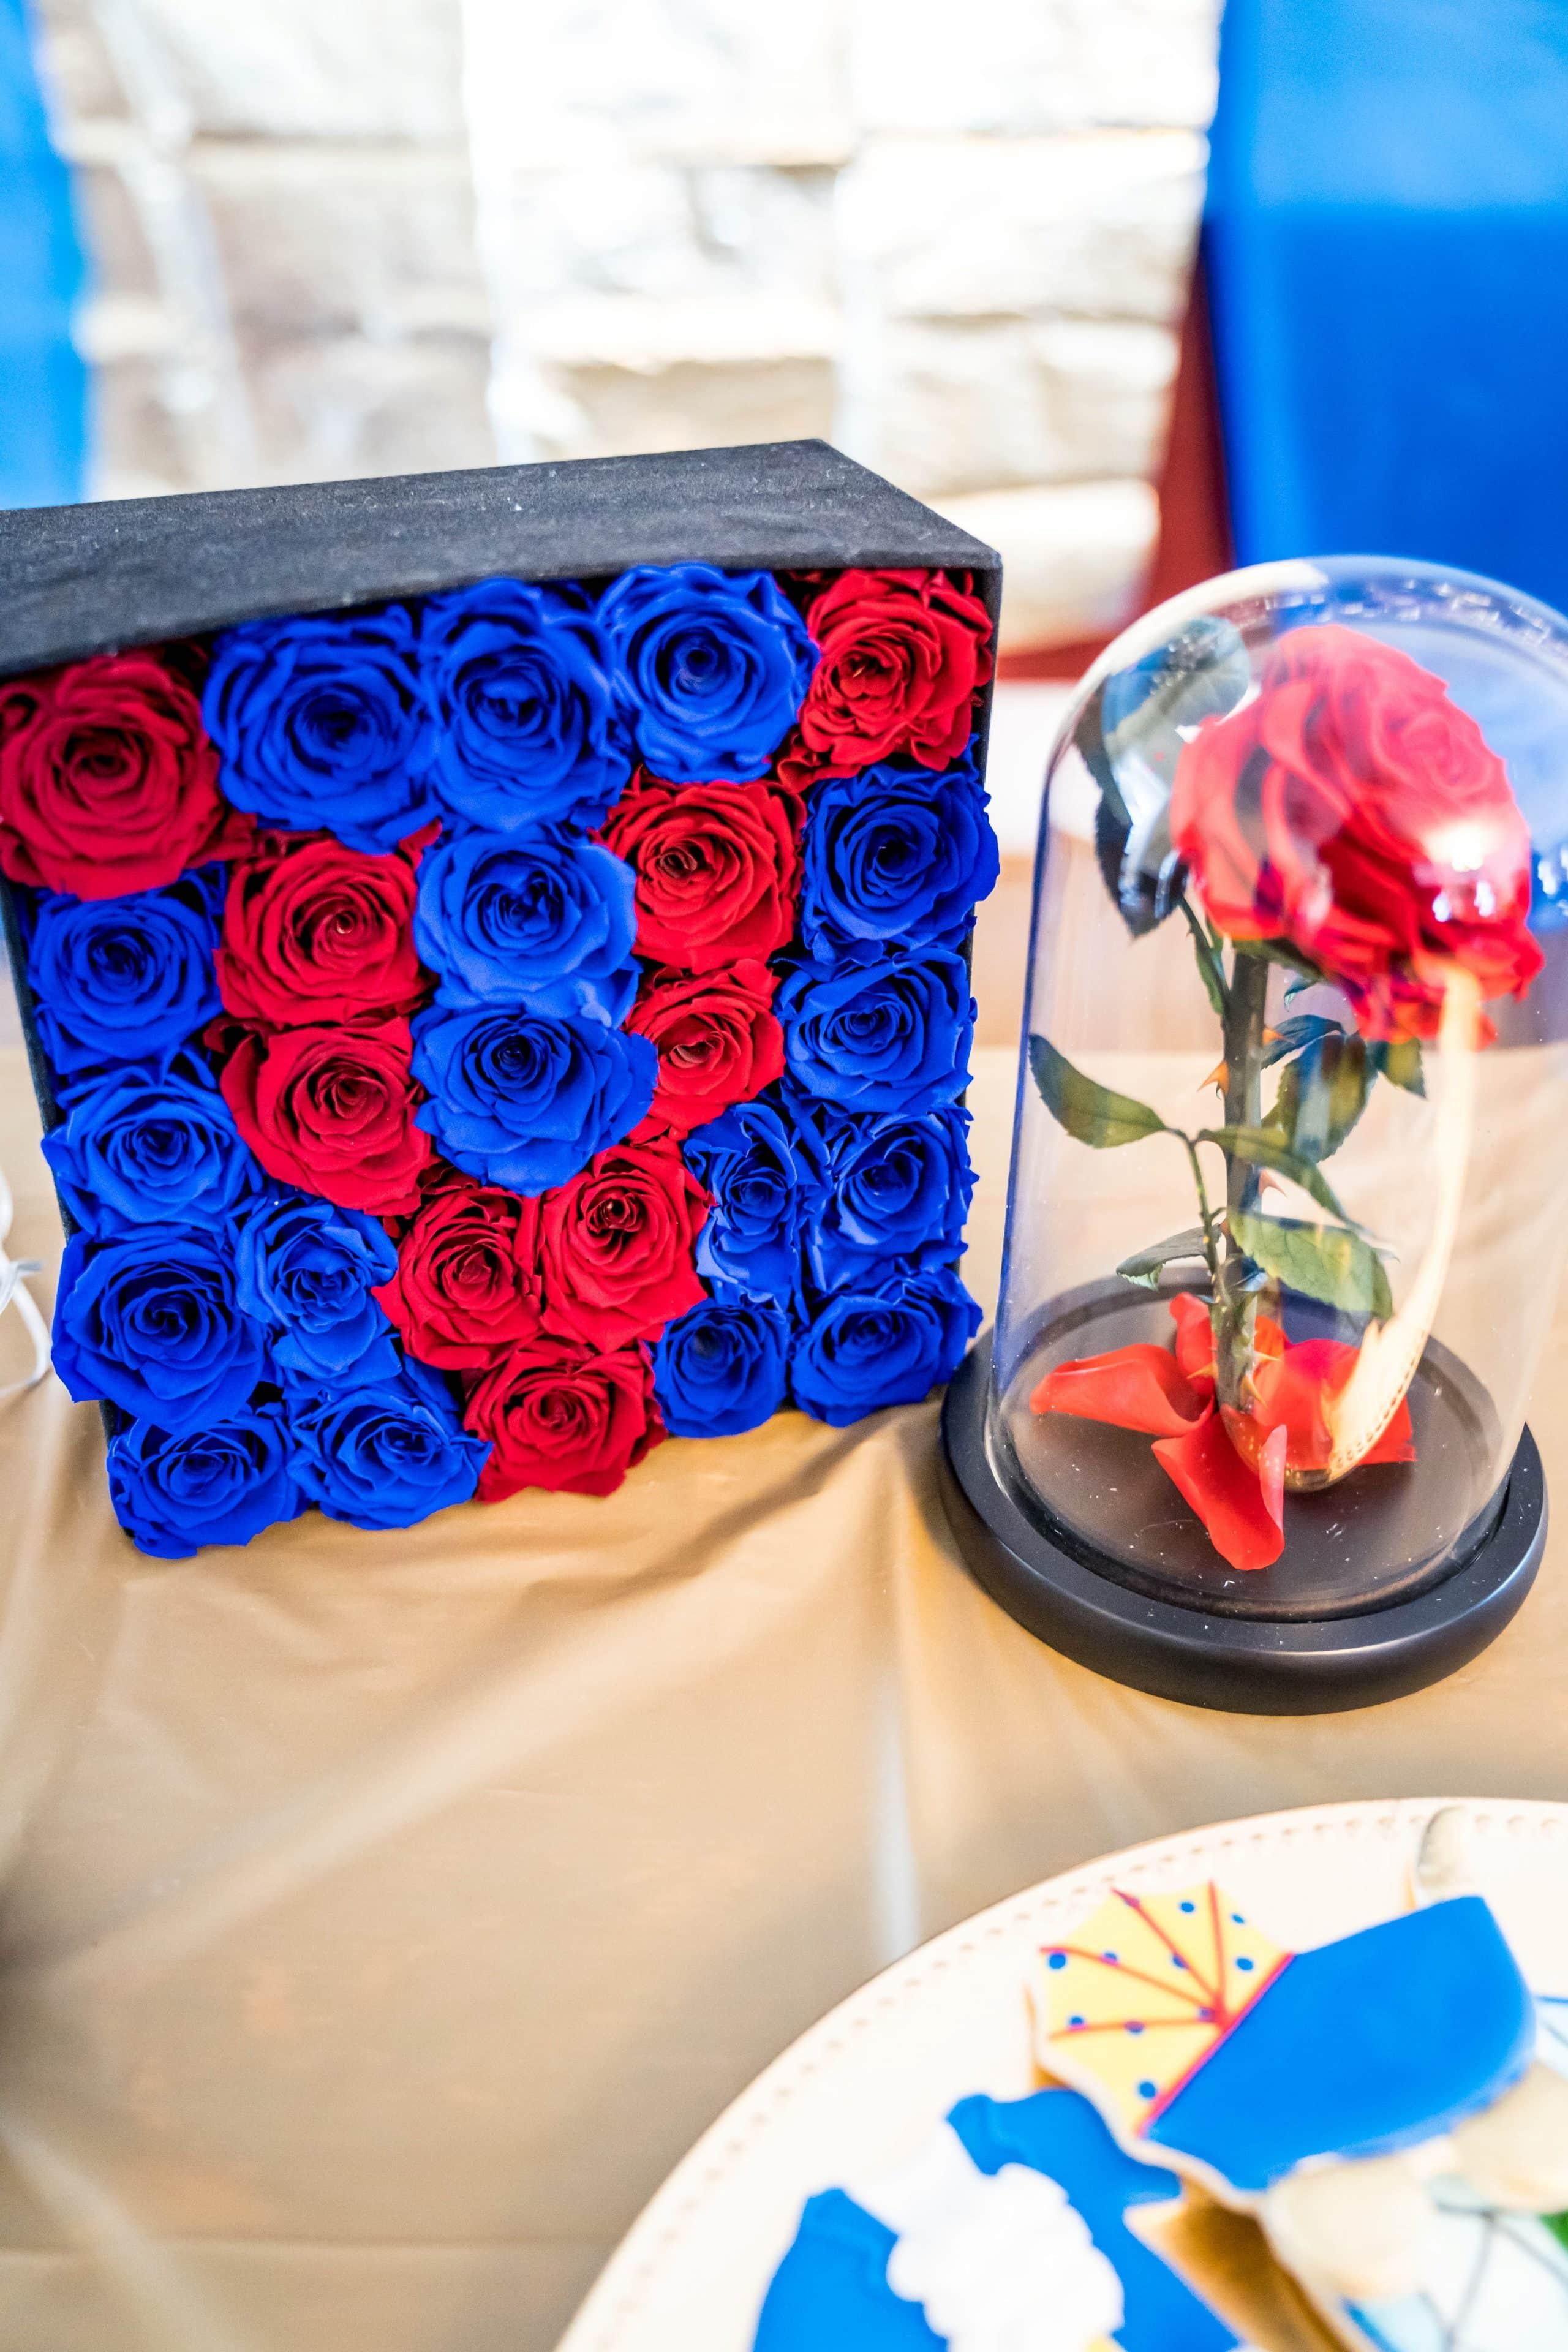 LivingLesh's flower box decoration